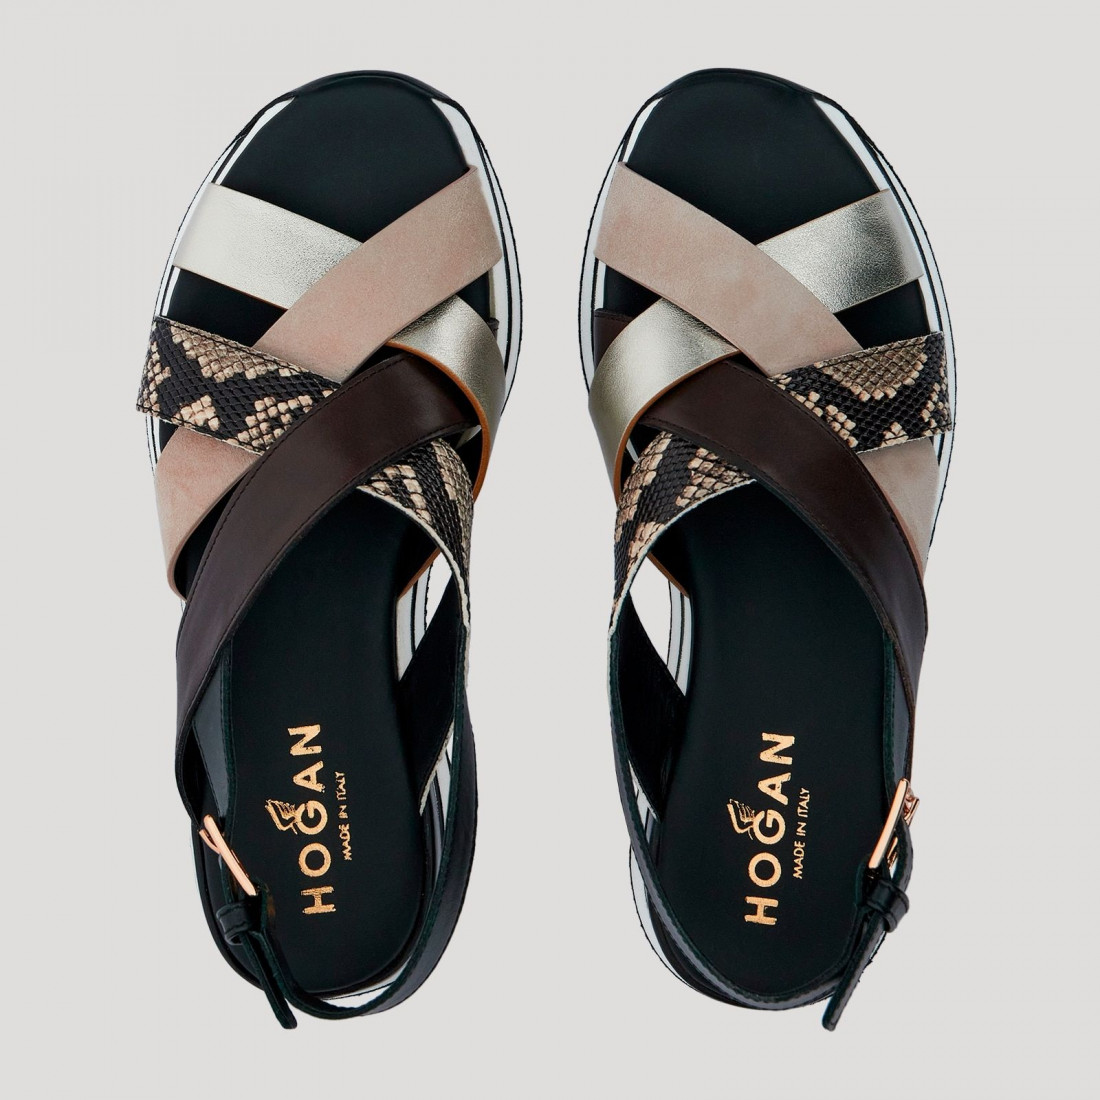 sneakers donna hogan hxw2570dk80pdt0rsq 8190